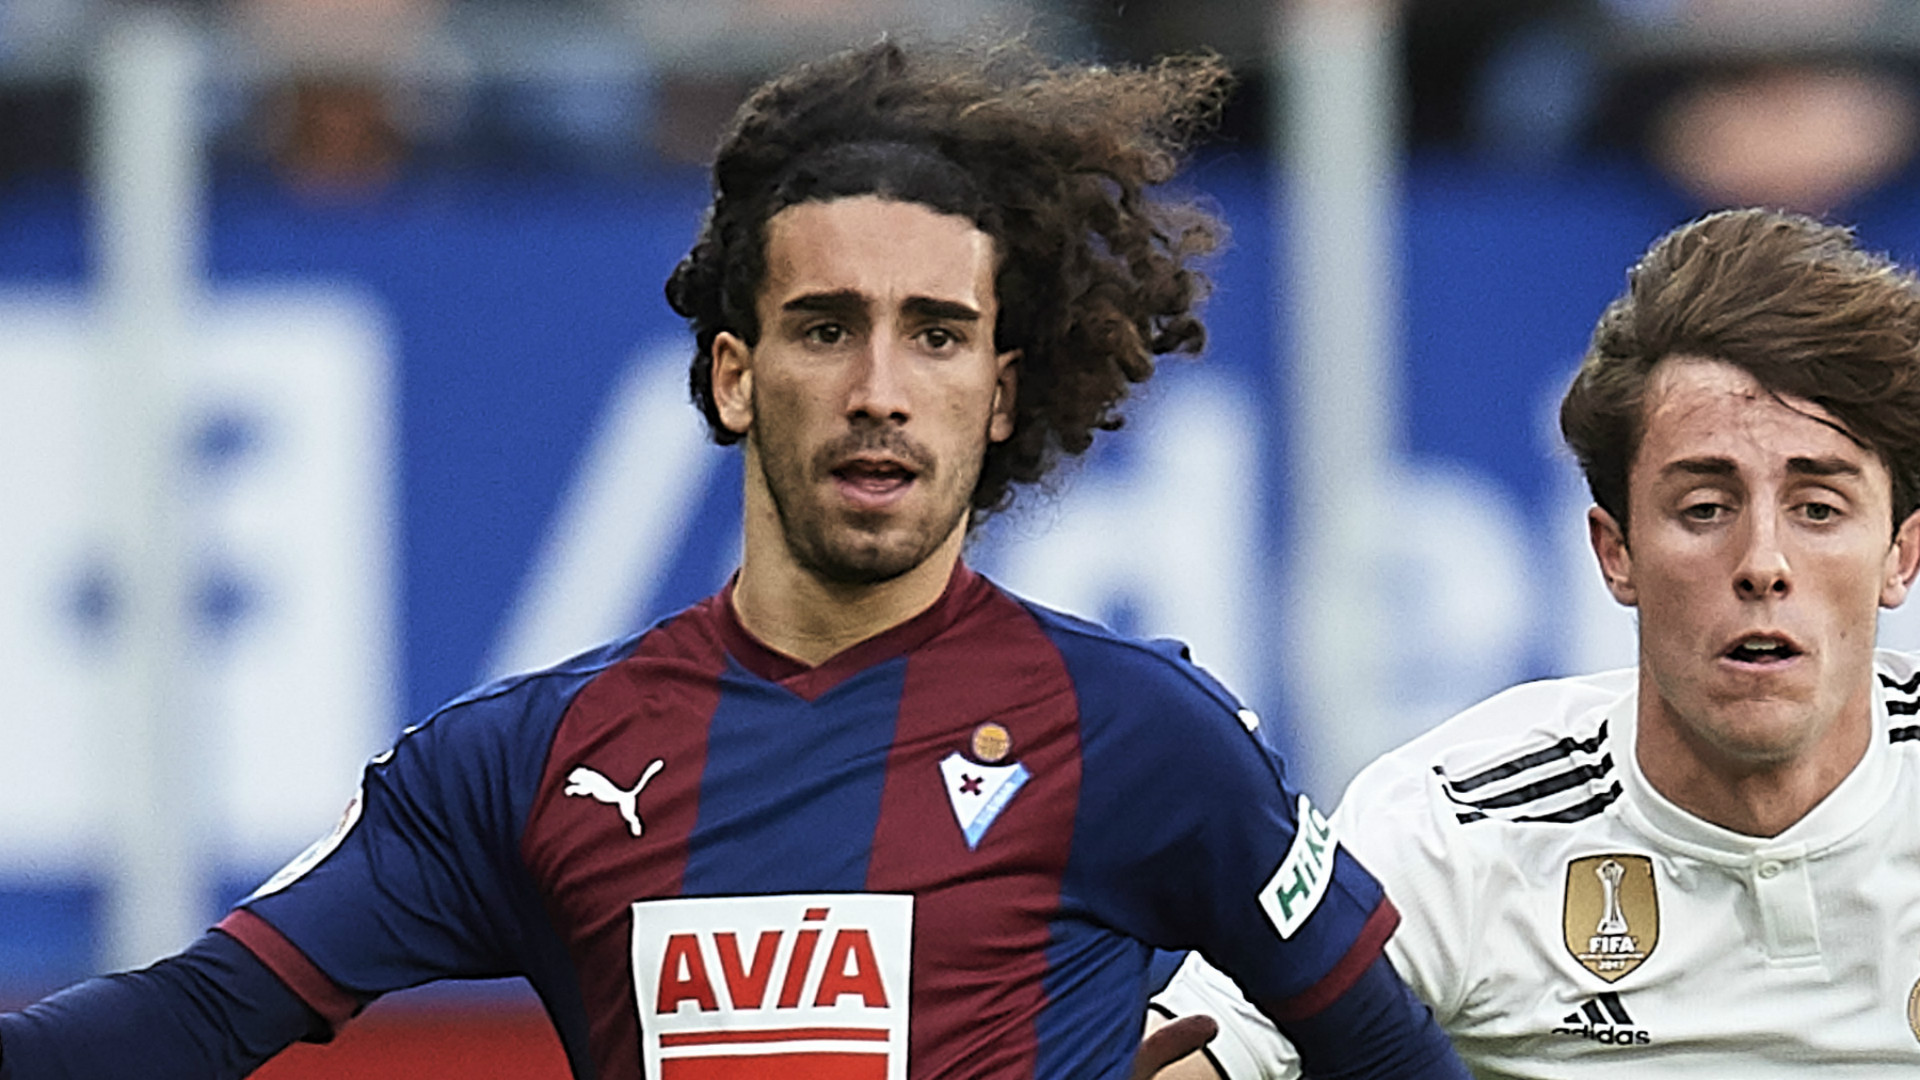 Mercato - Barça : Marc Cucurella prend la direction de Getafe